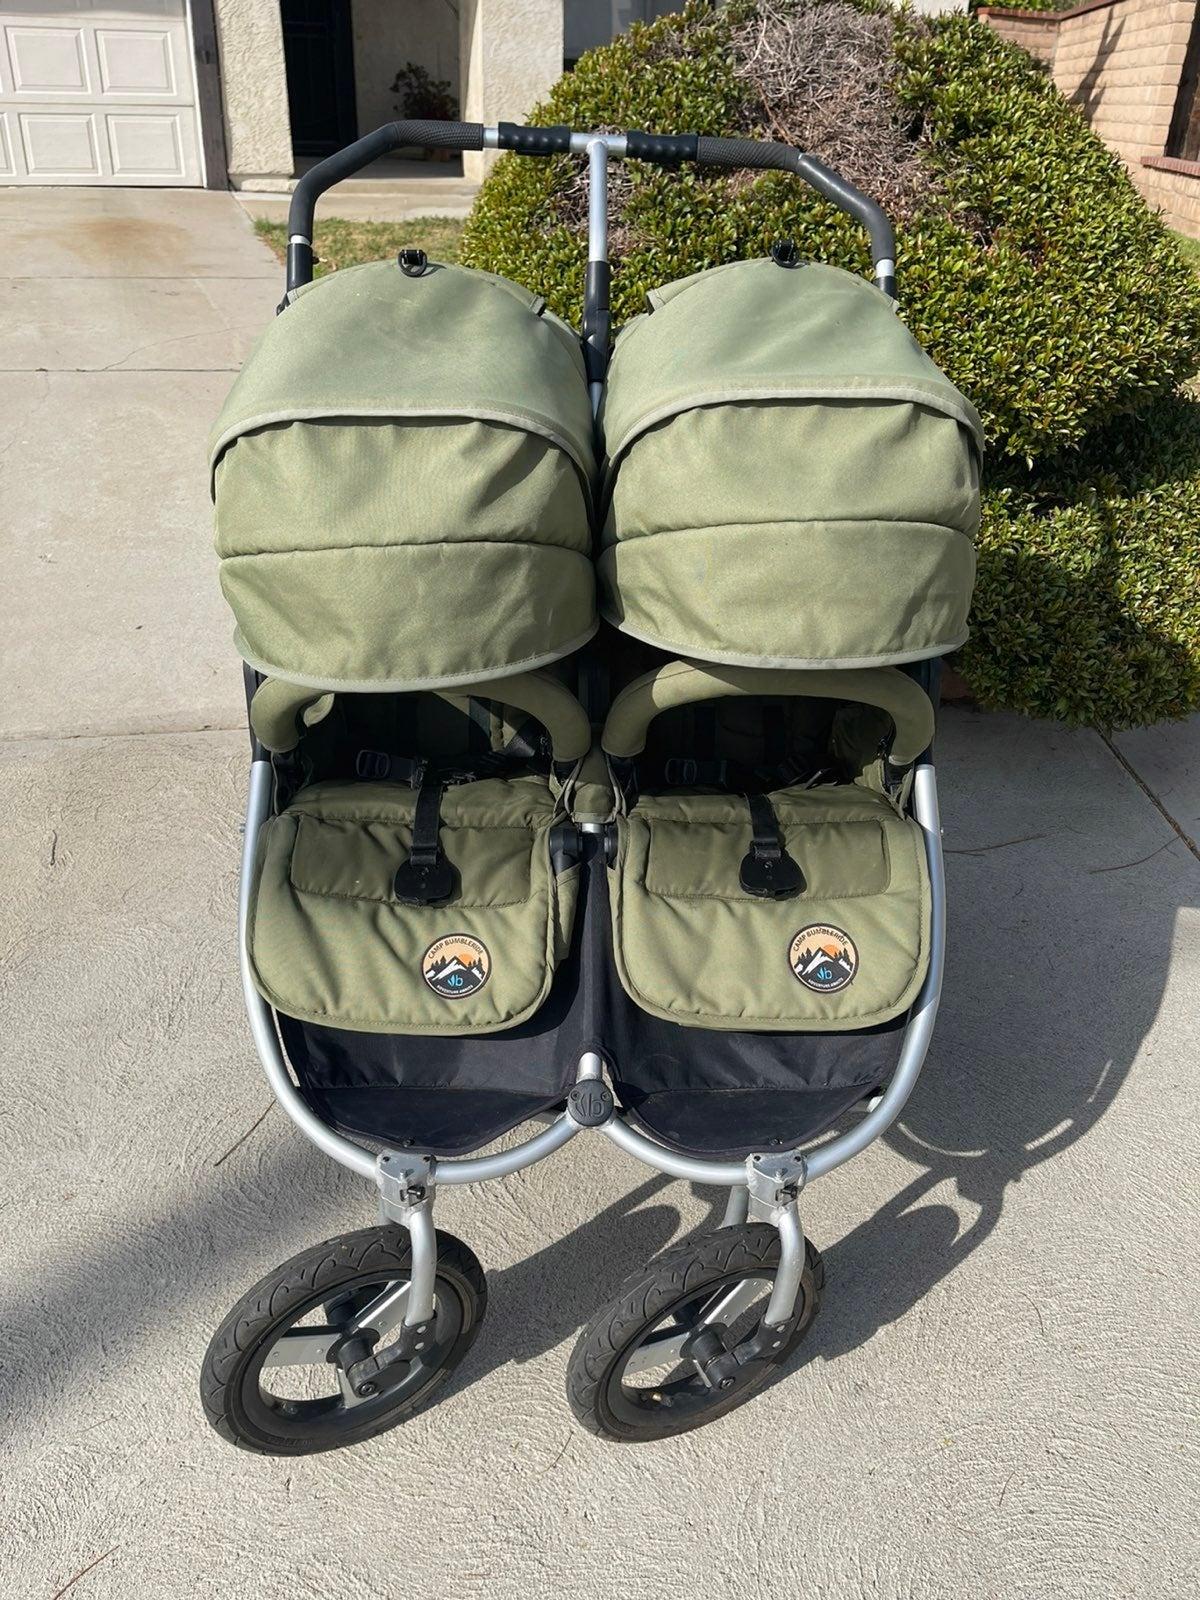 Bumbleride indie twin stroller